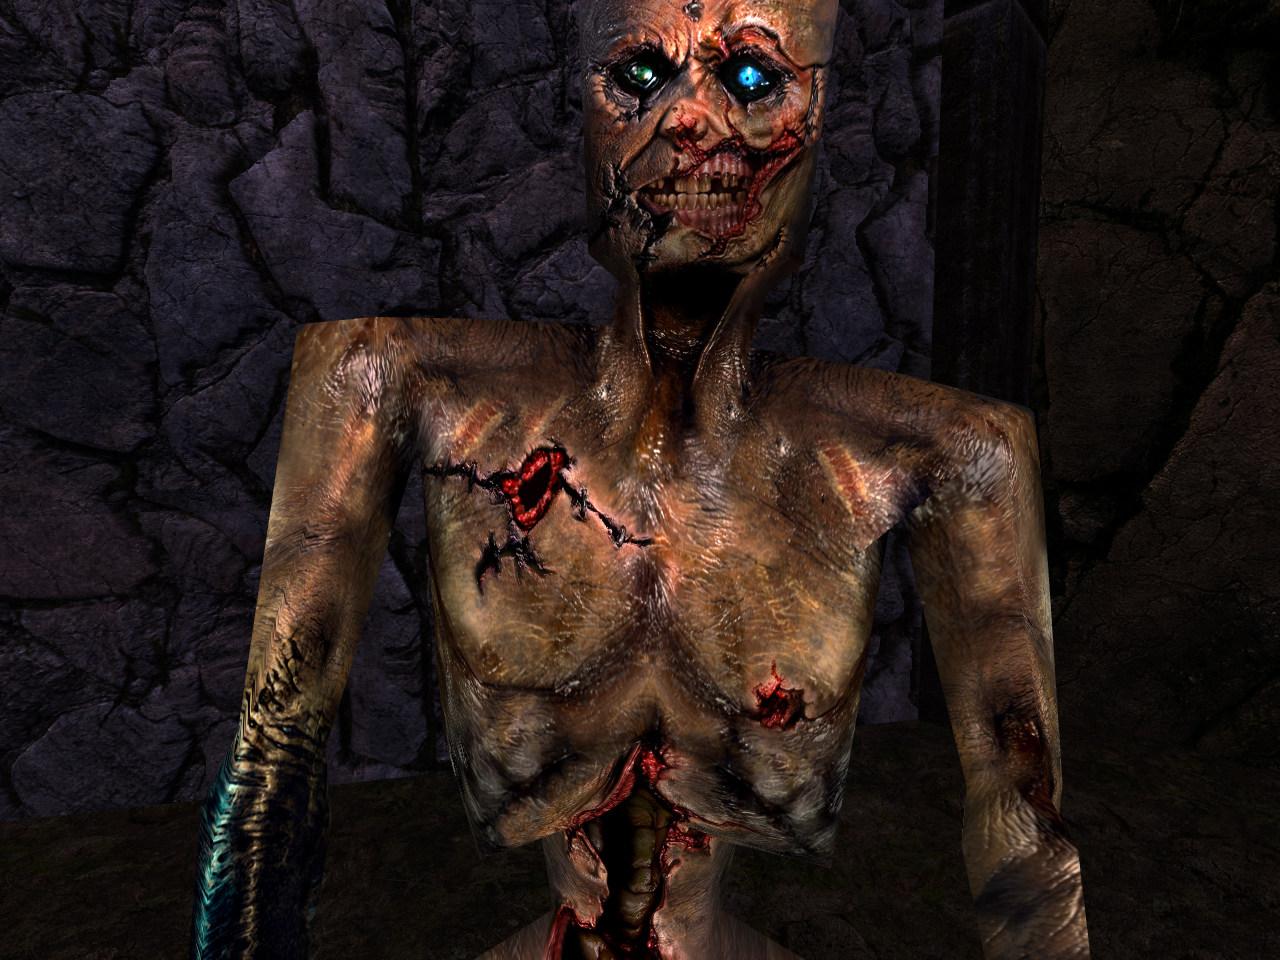 Quake Reforged - Bestiary - Quake - The Zombie Quake Vore